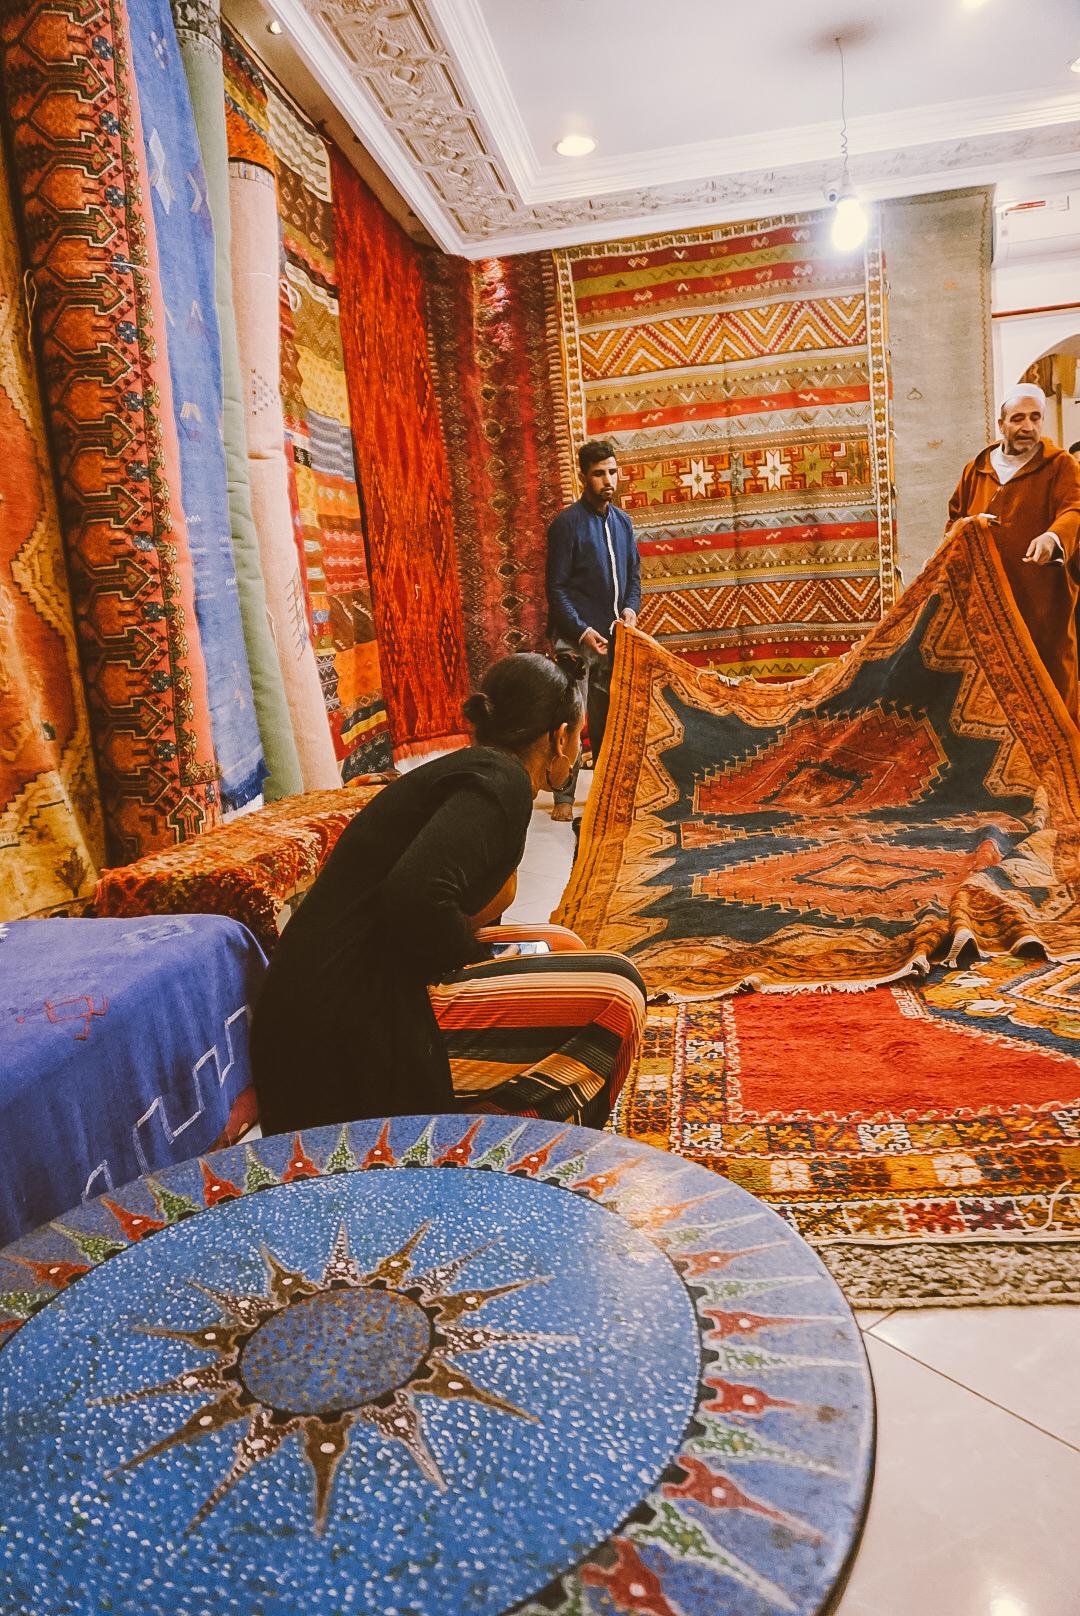 Our Stay at Riad Dar Zaman- Monique McHugh Blog